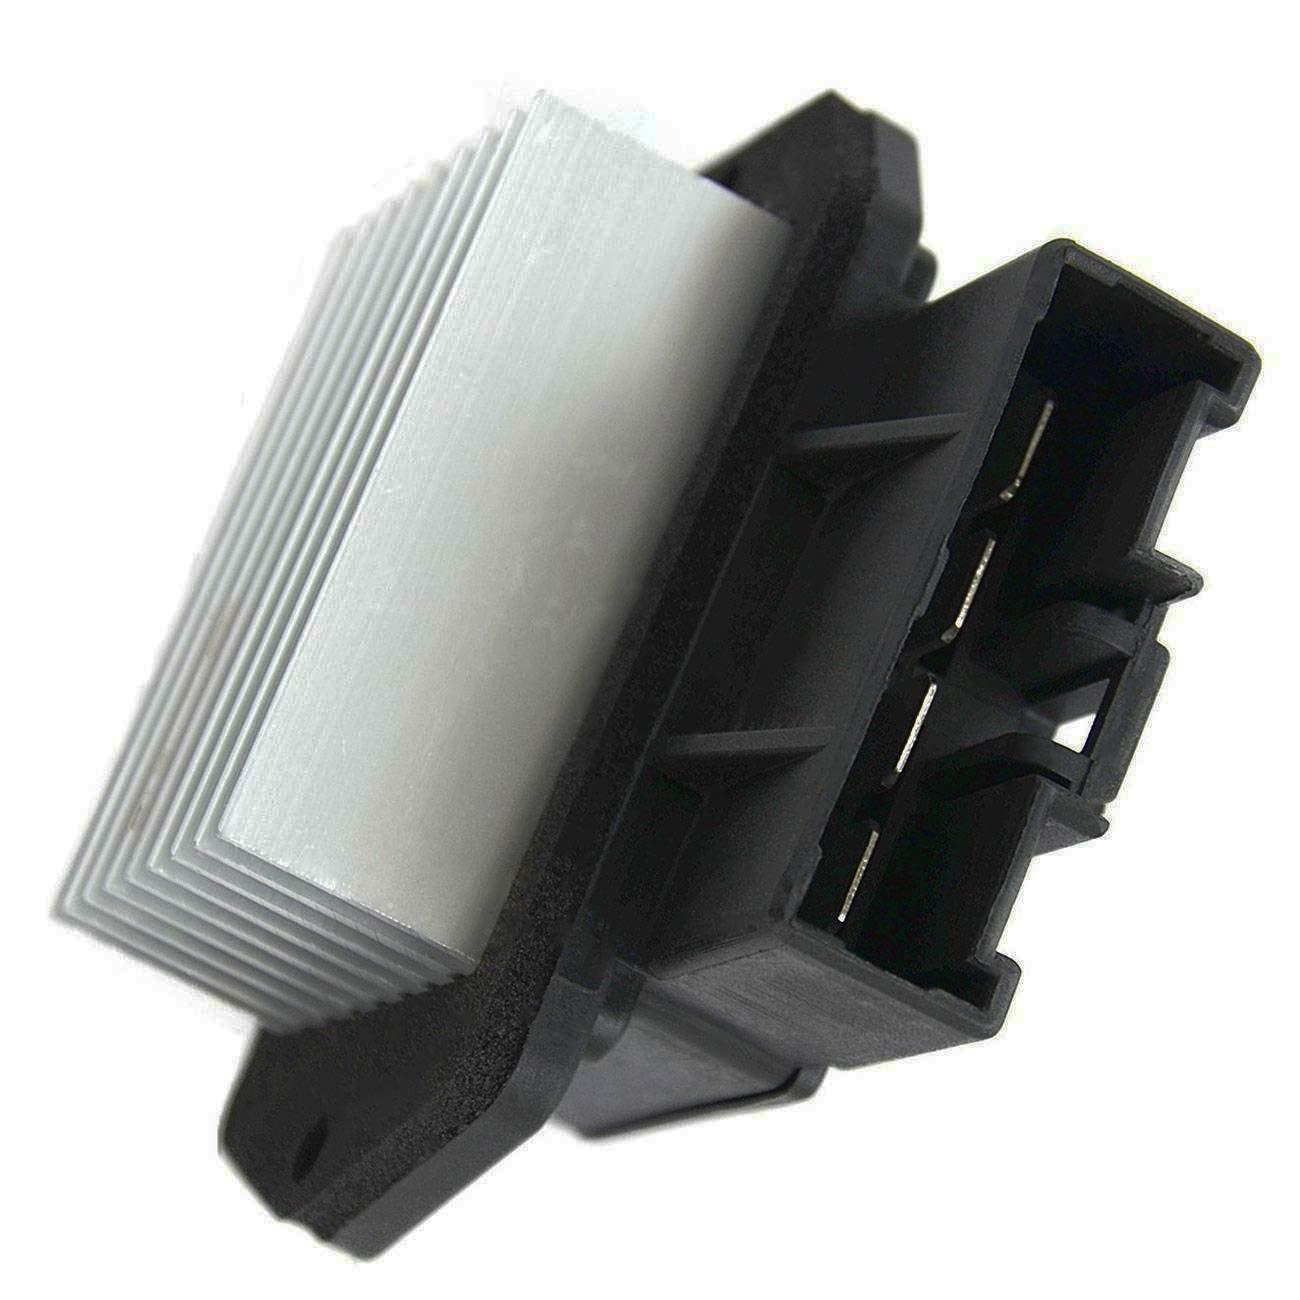 87165-13010 HVAC Blower Motor Control Unit For Toyota 4Runner Camry Solara Lexus ES300 ES330 GX470 RX330 RX350 RX400h Scion tC Blower Fan Motor Resistor Regulator